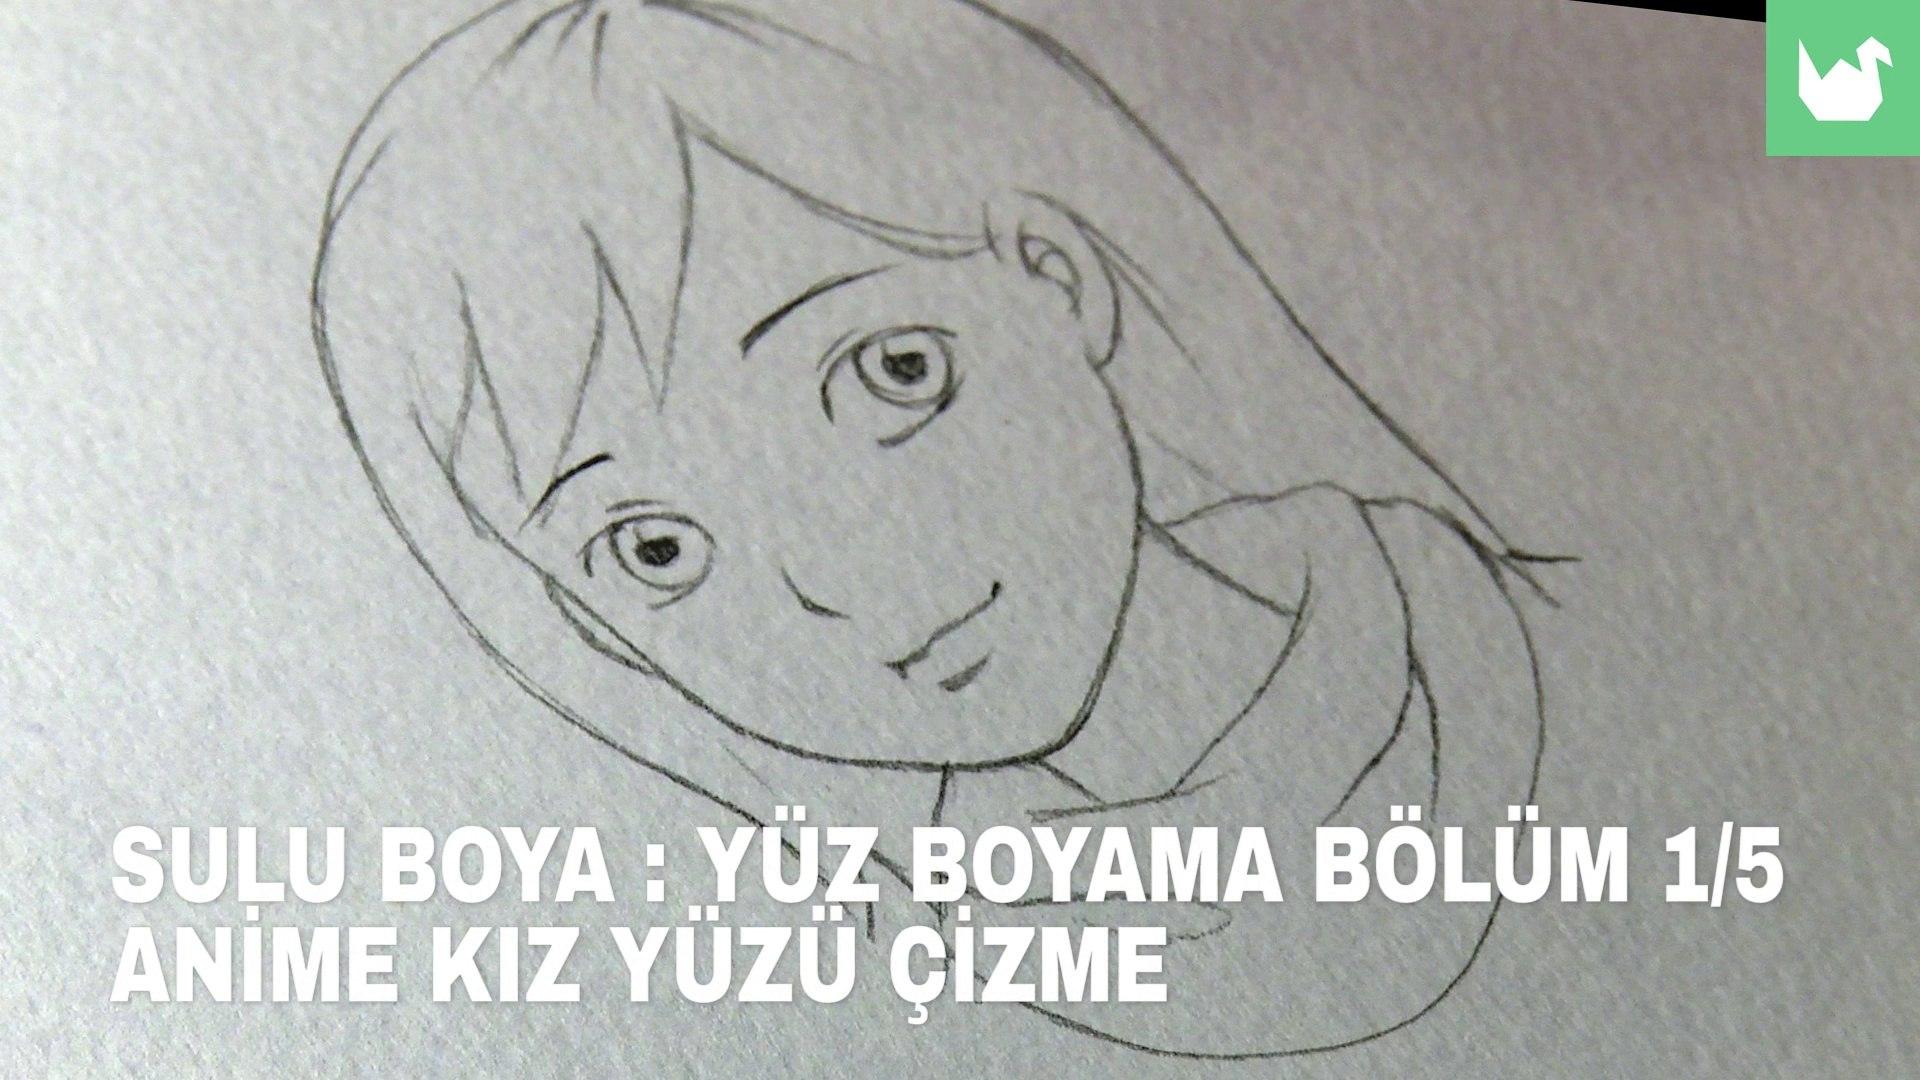 Sulu Boya Yuz Boyama 1 5 Anime Kiz Yuzu Cizme Video Dailymotion